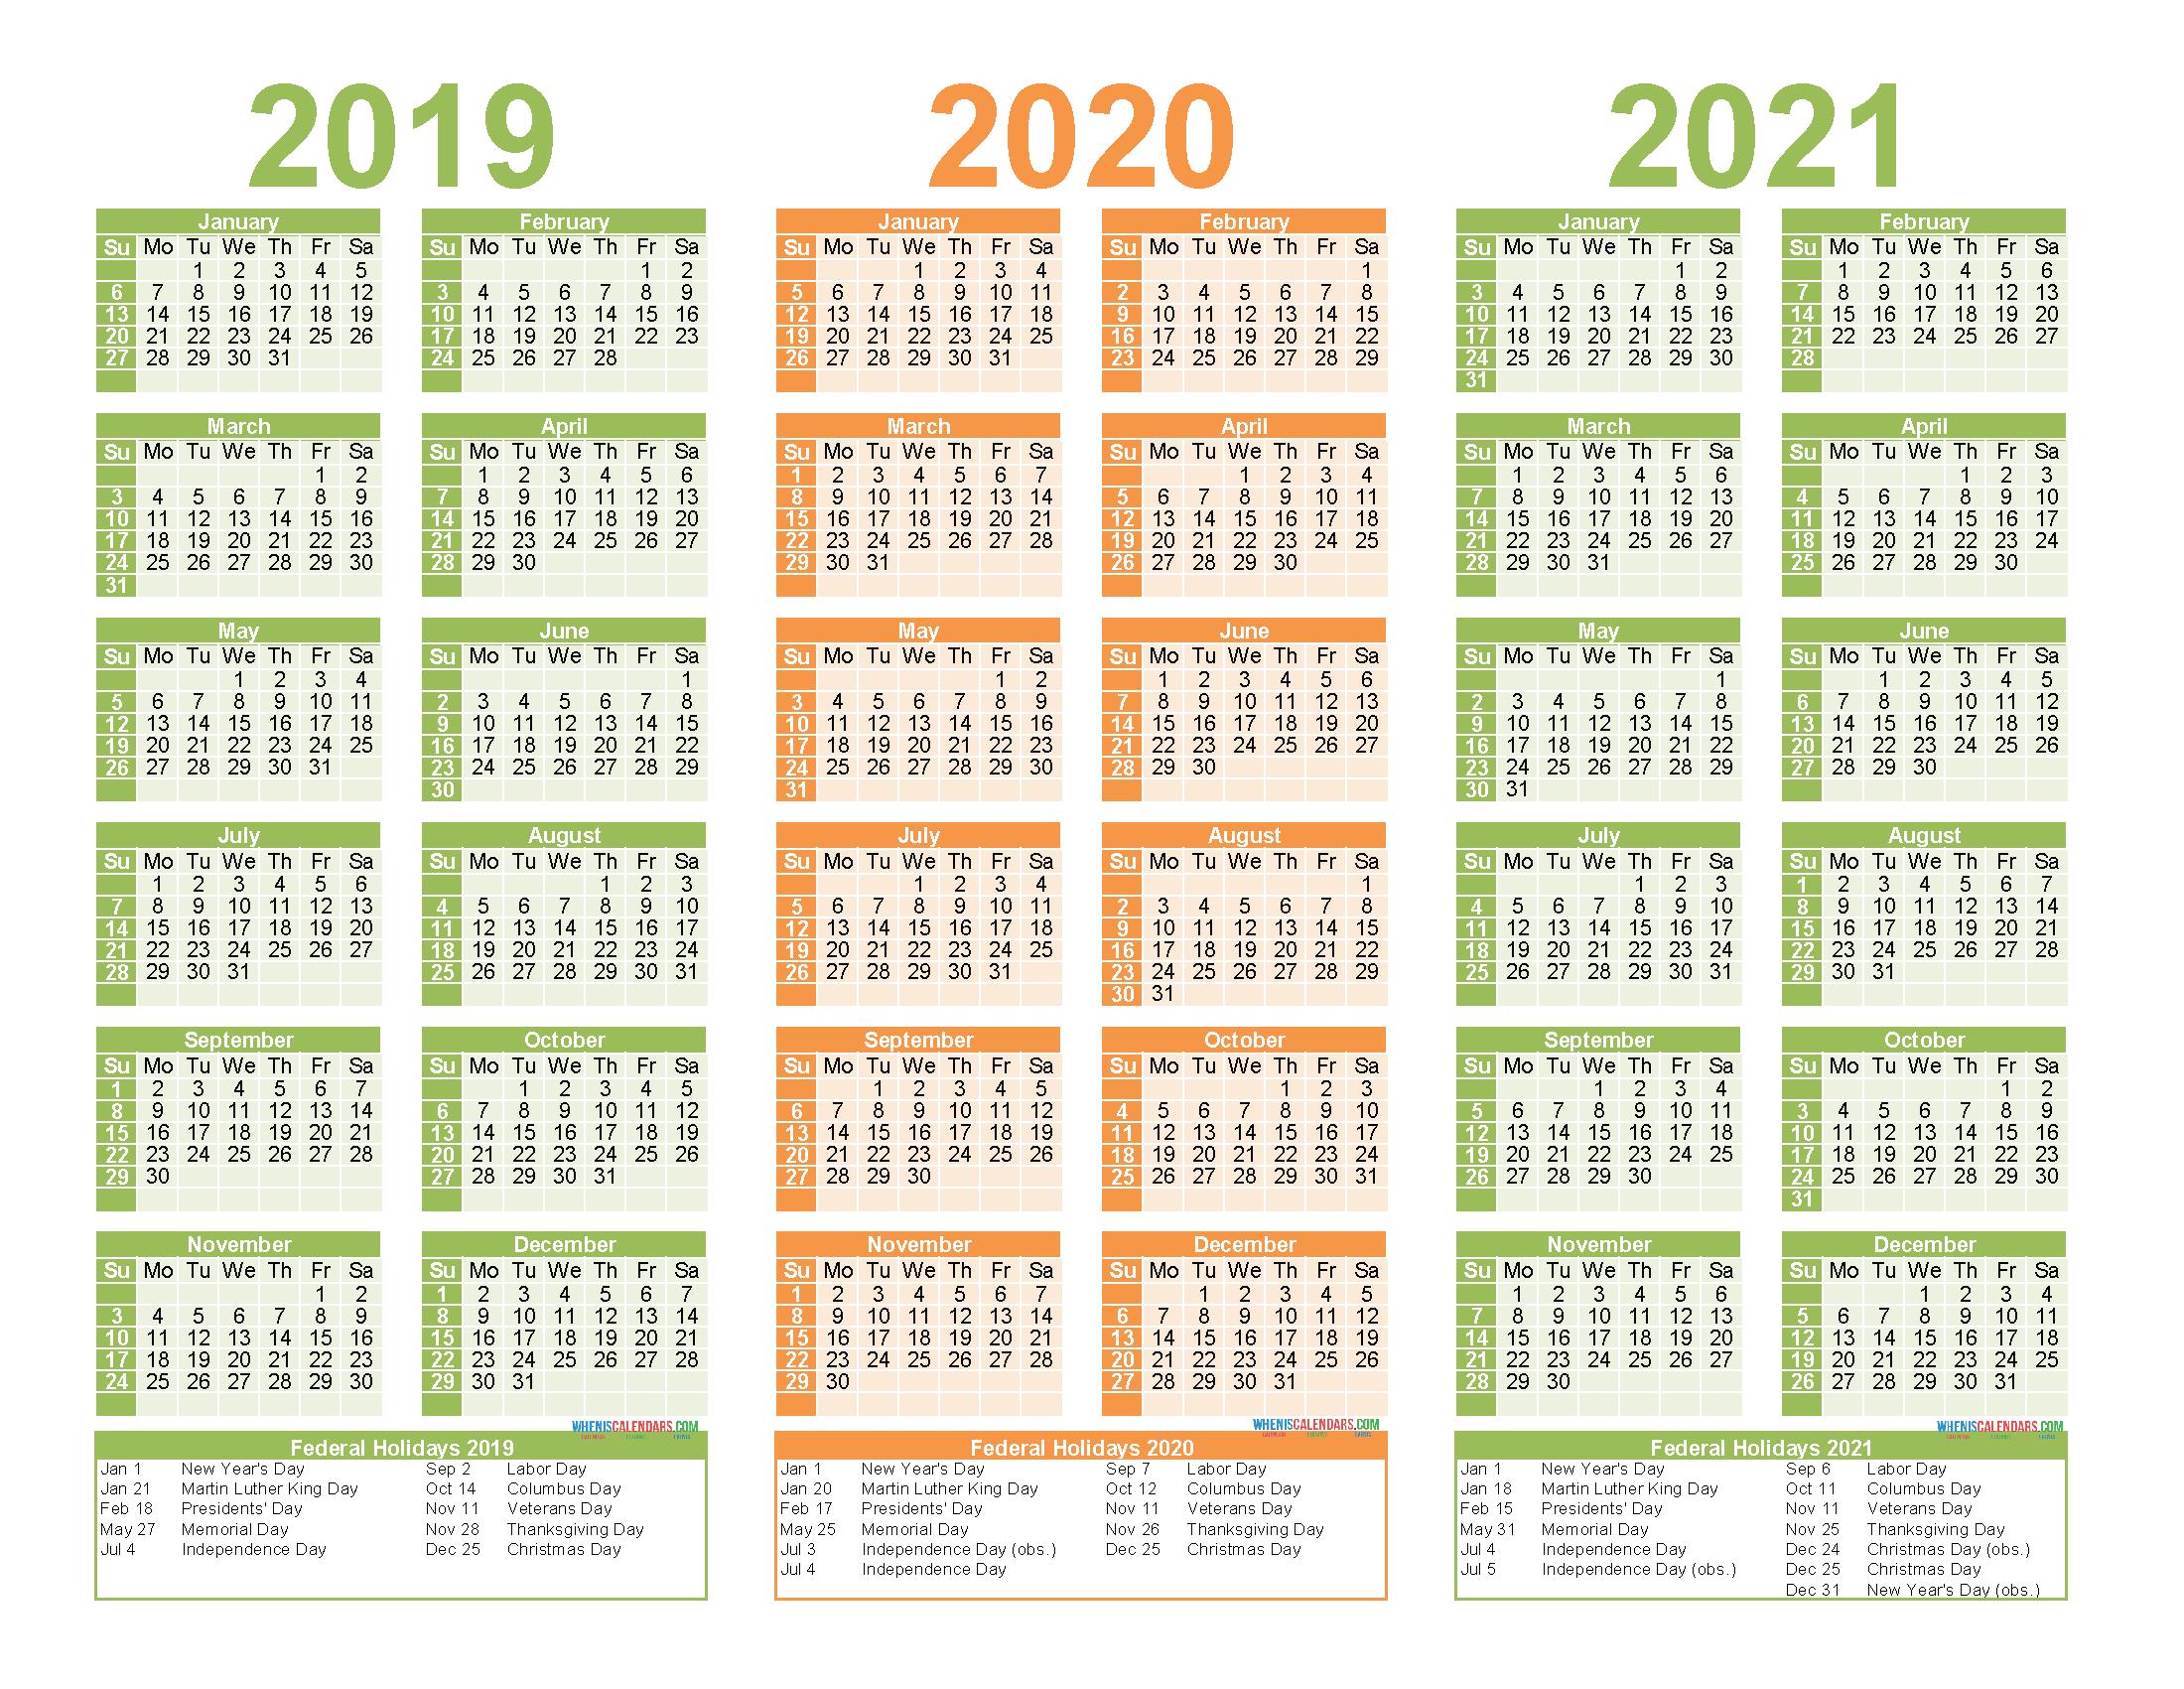 2019 to 2021 Calendar Printable Free PDF, Word, Image